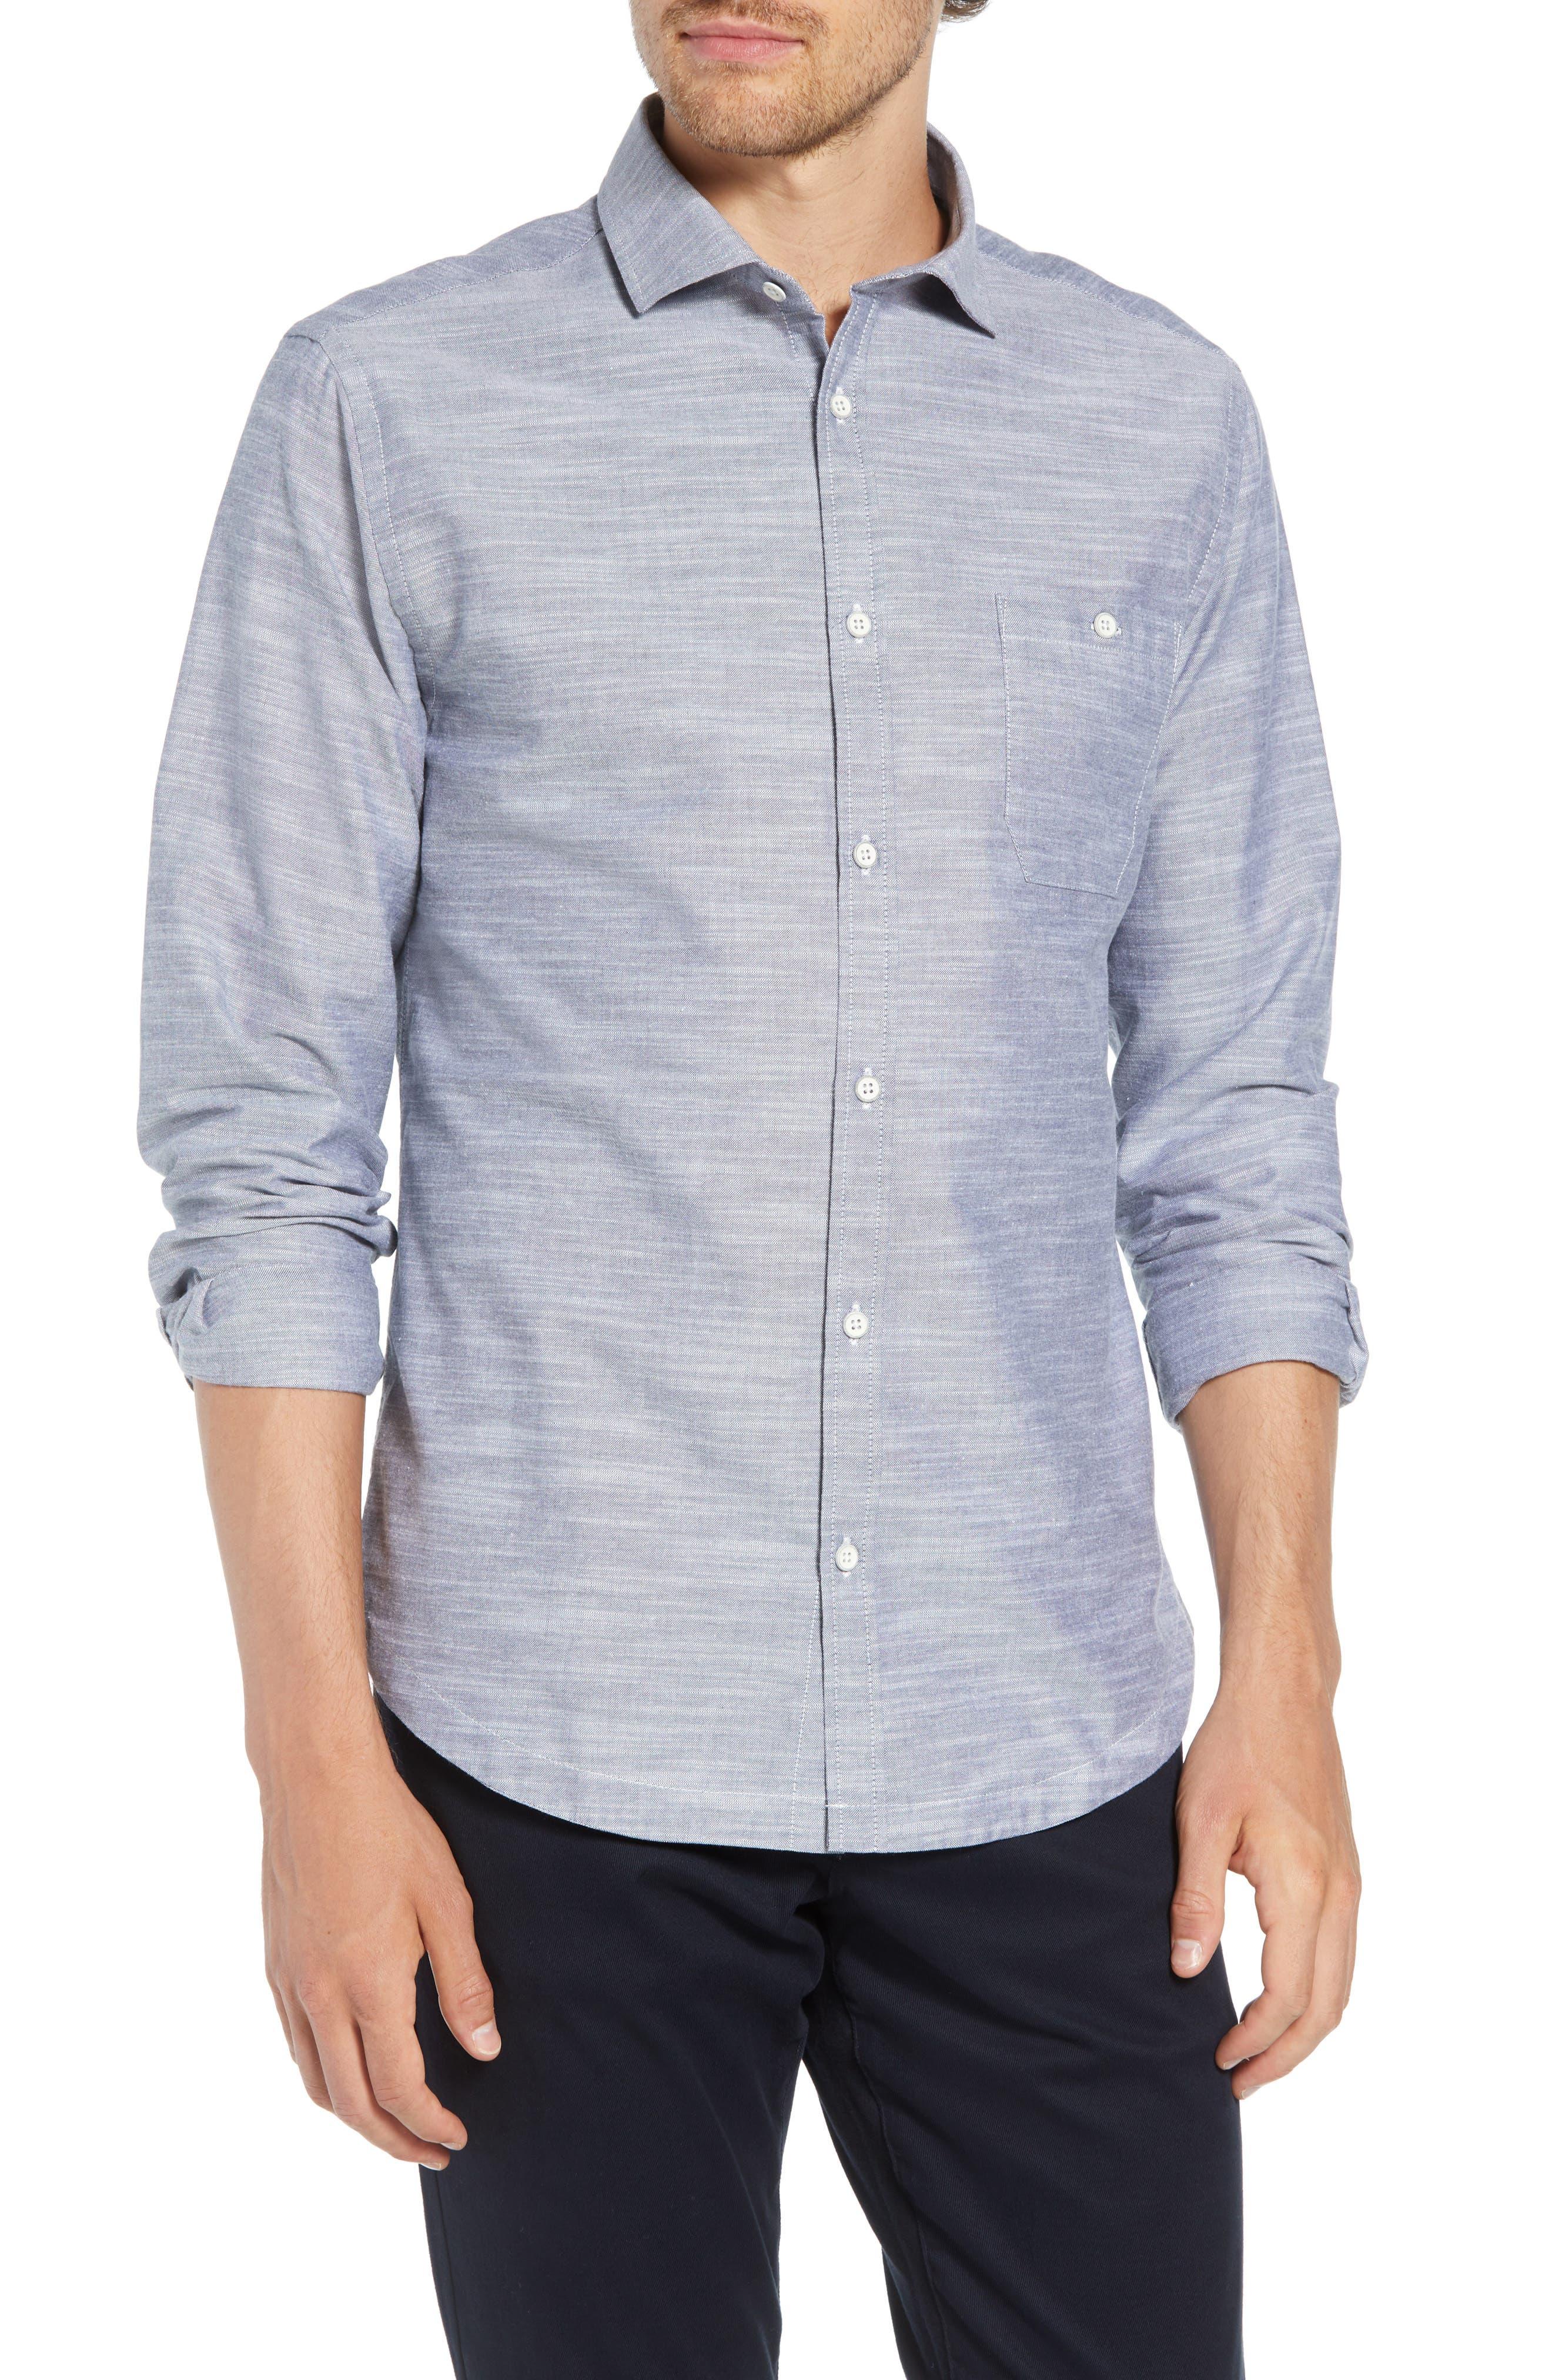 Rugger Regular Fit Sport Shirt,                         Main,                         color, 029